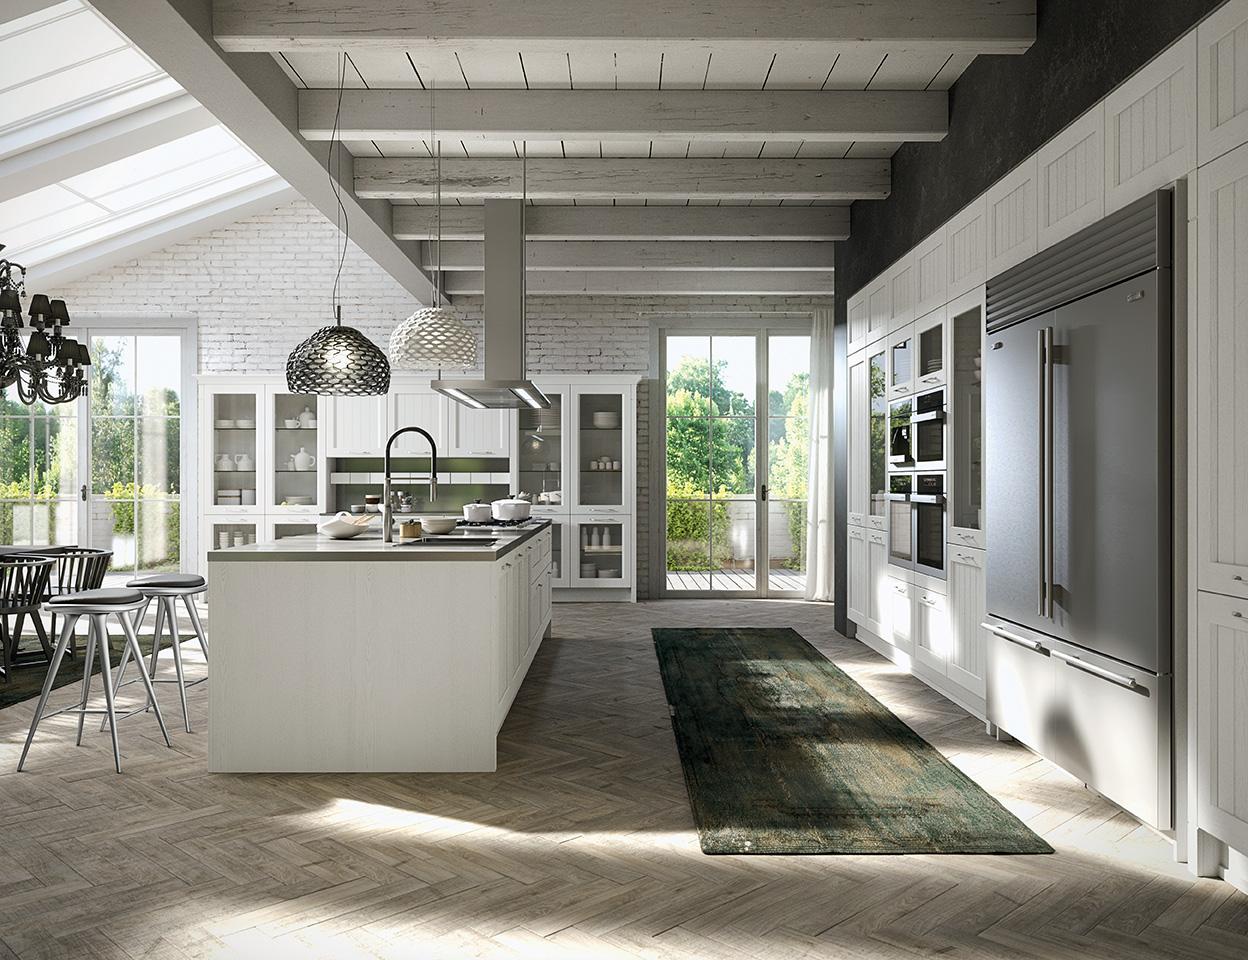 Opinioni Su Arrital Cucine cucina arrital modello village american mood - arredamento